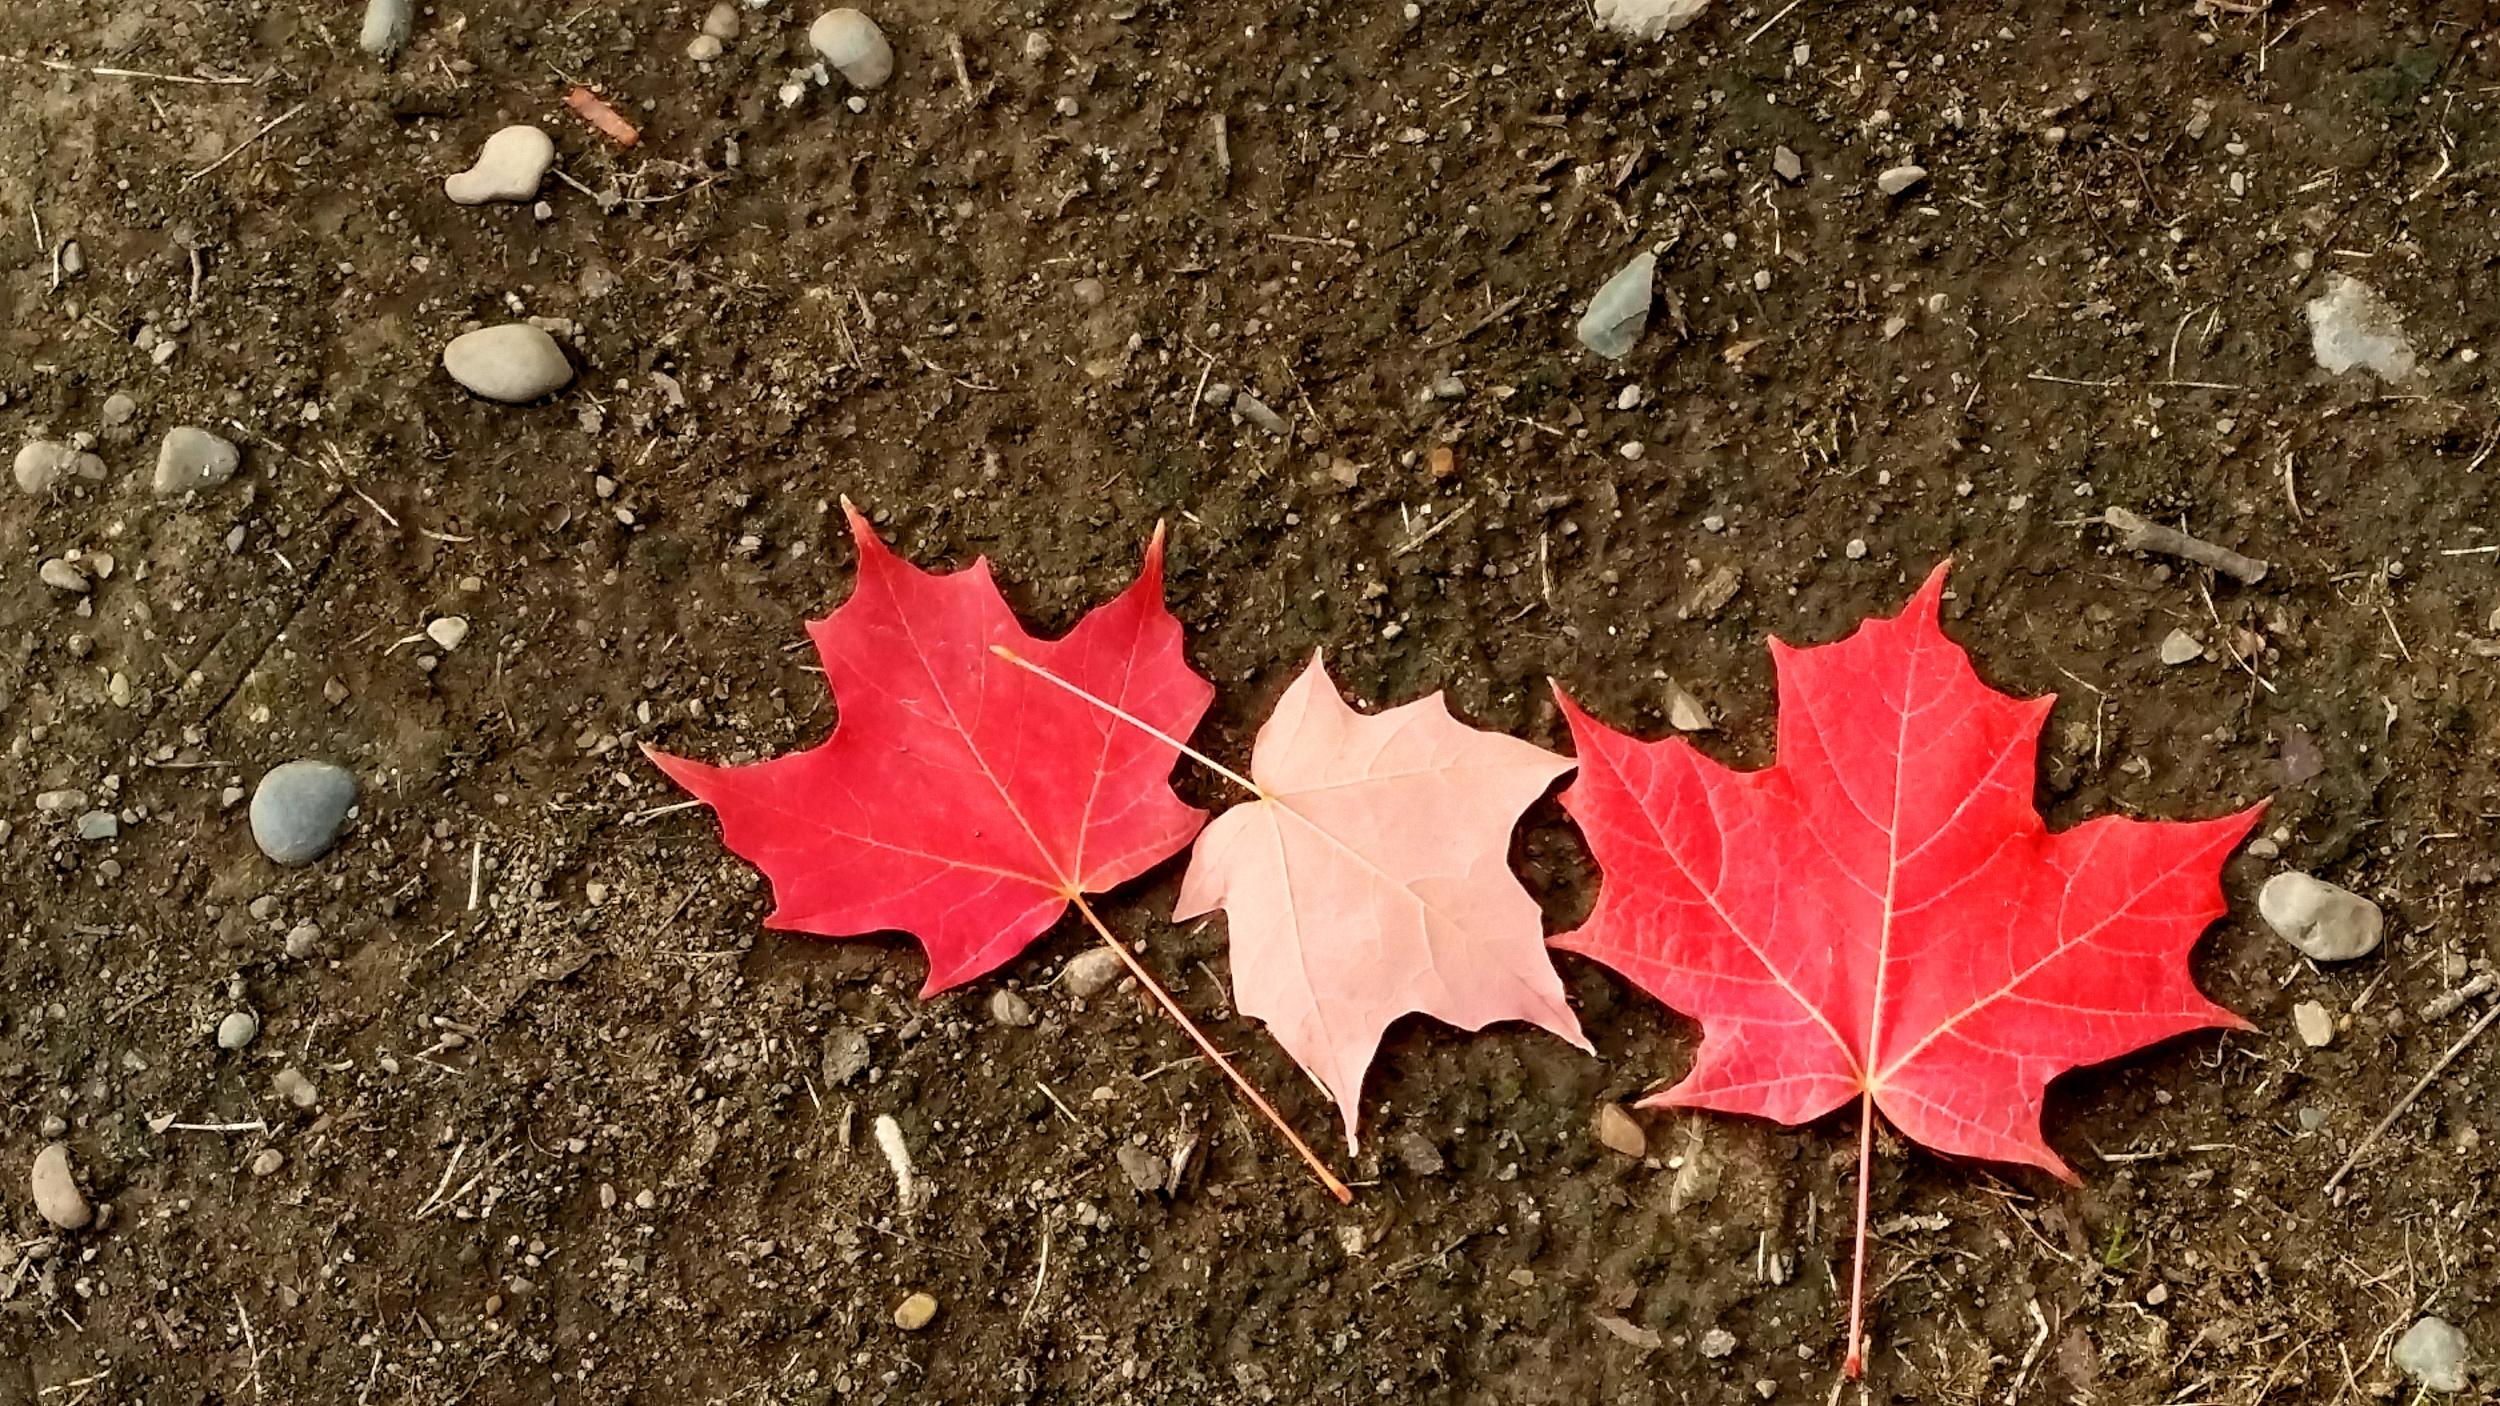 Fall - the season of letting go!